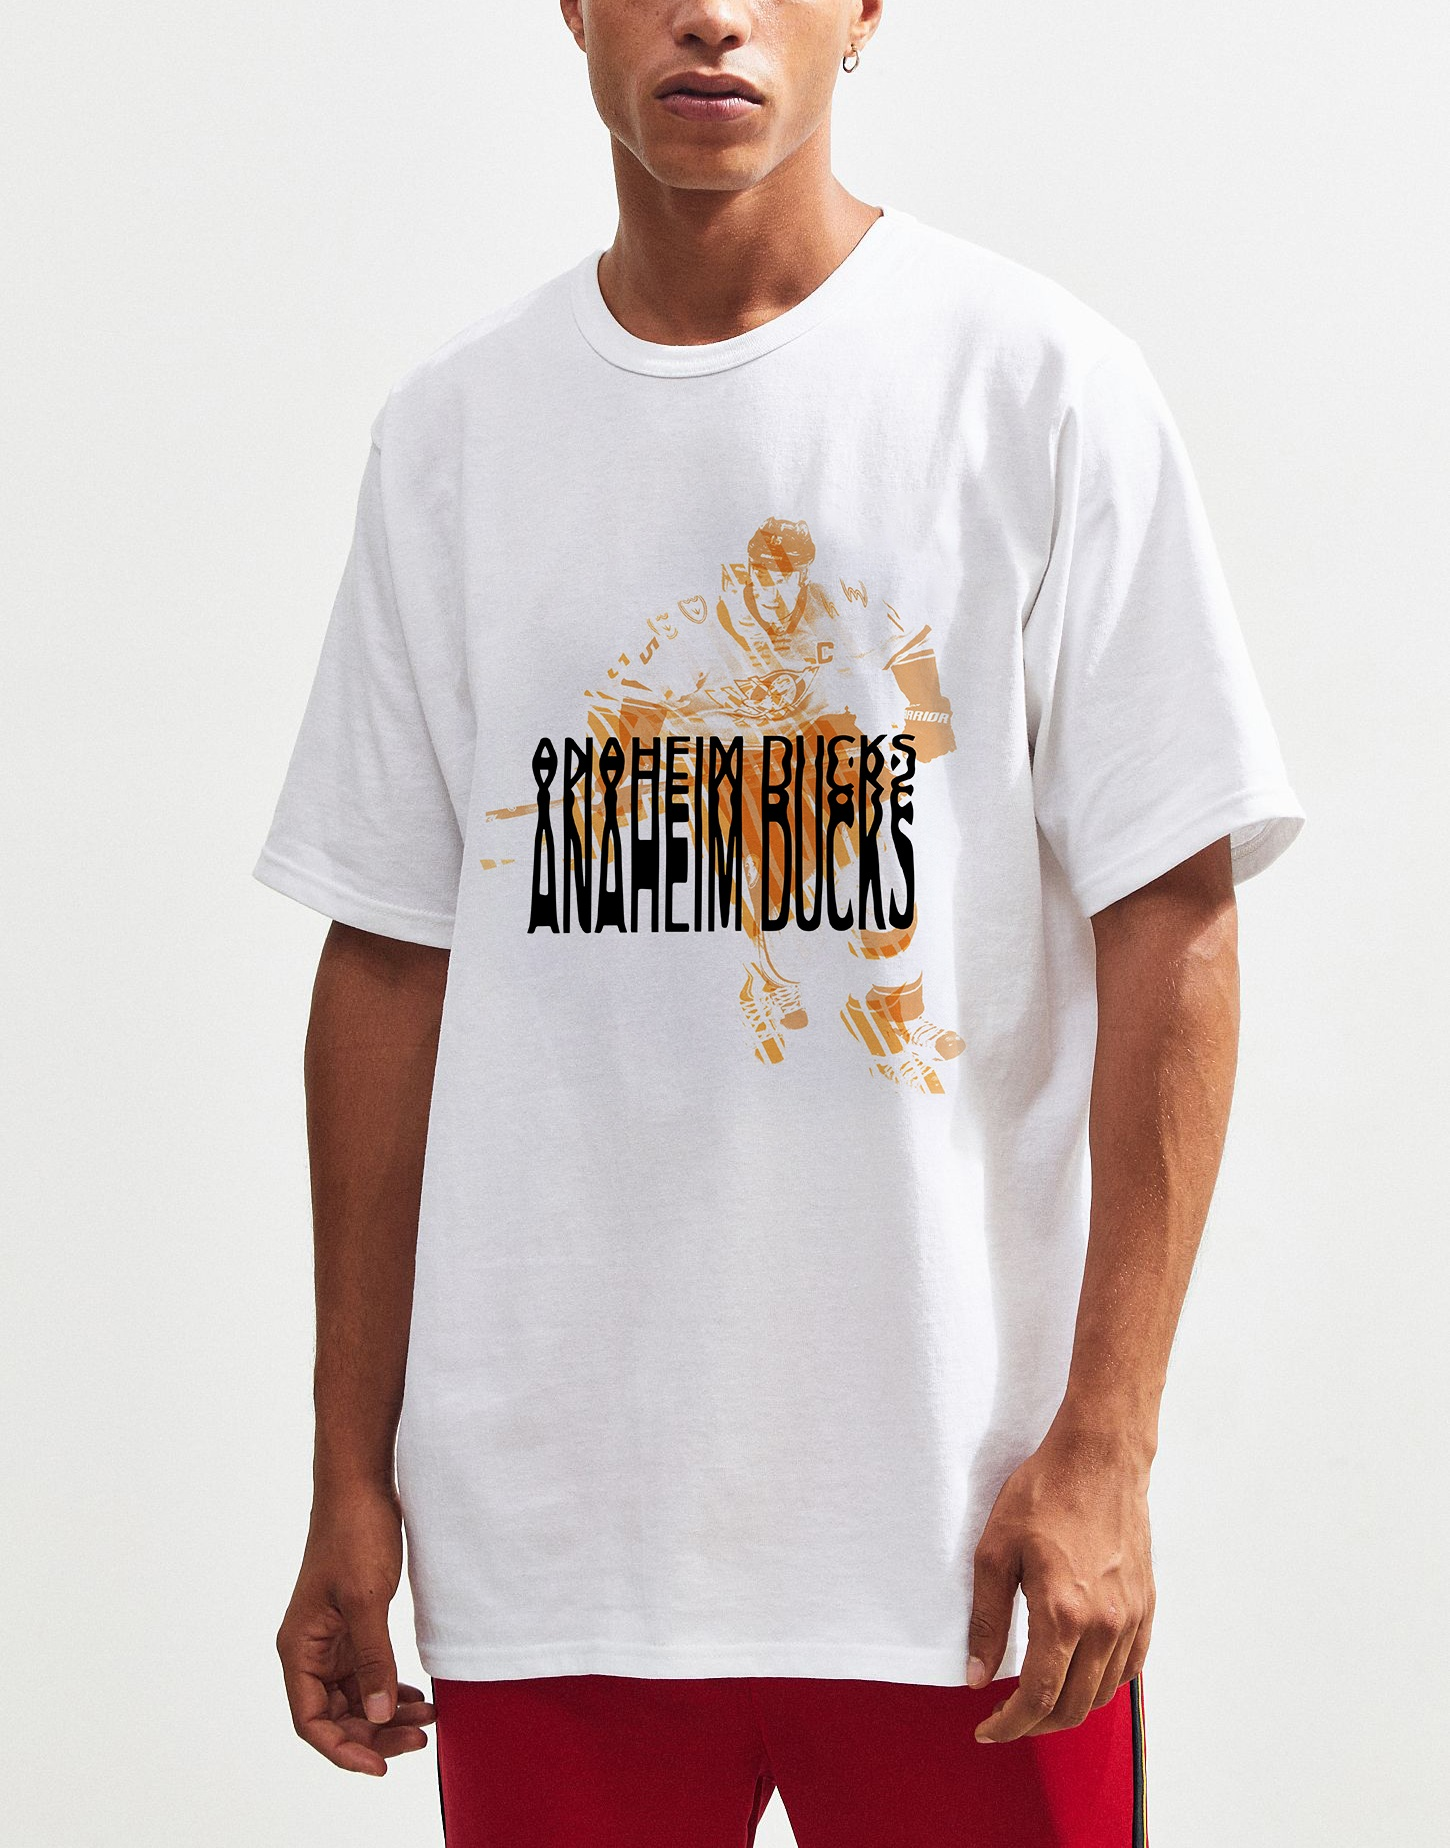 player+shirt.jpg